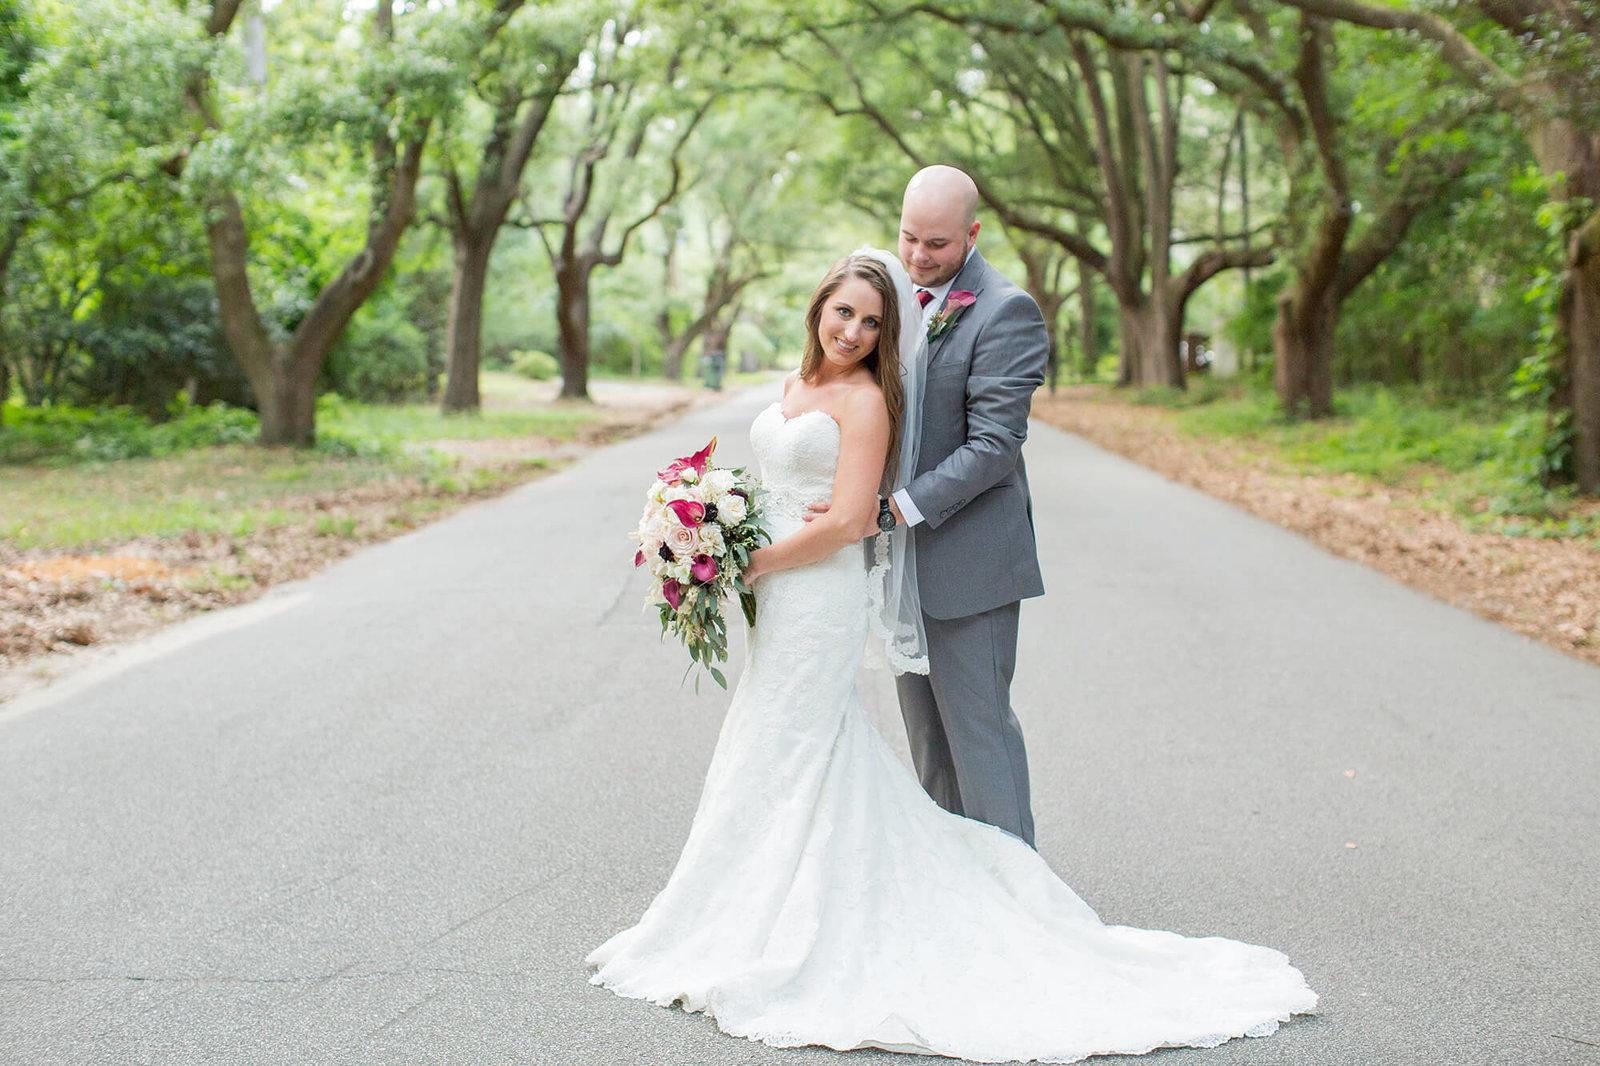 VAUSE-Wedding_SC-Wedding-Photographer_Jessica-Hunt-Photography_2016-60